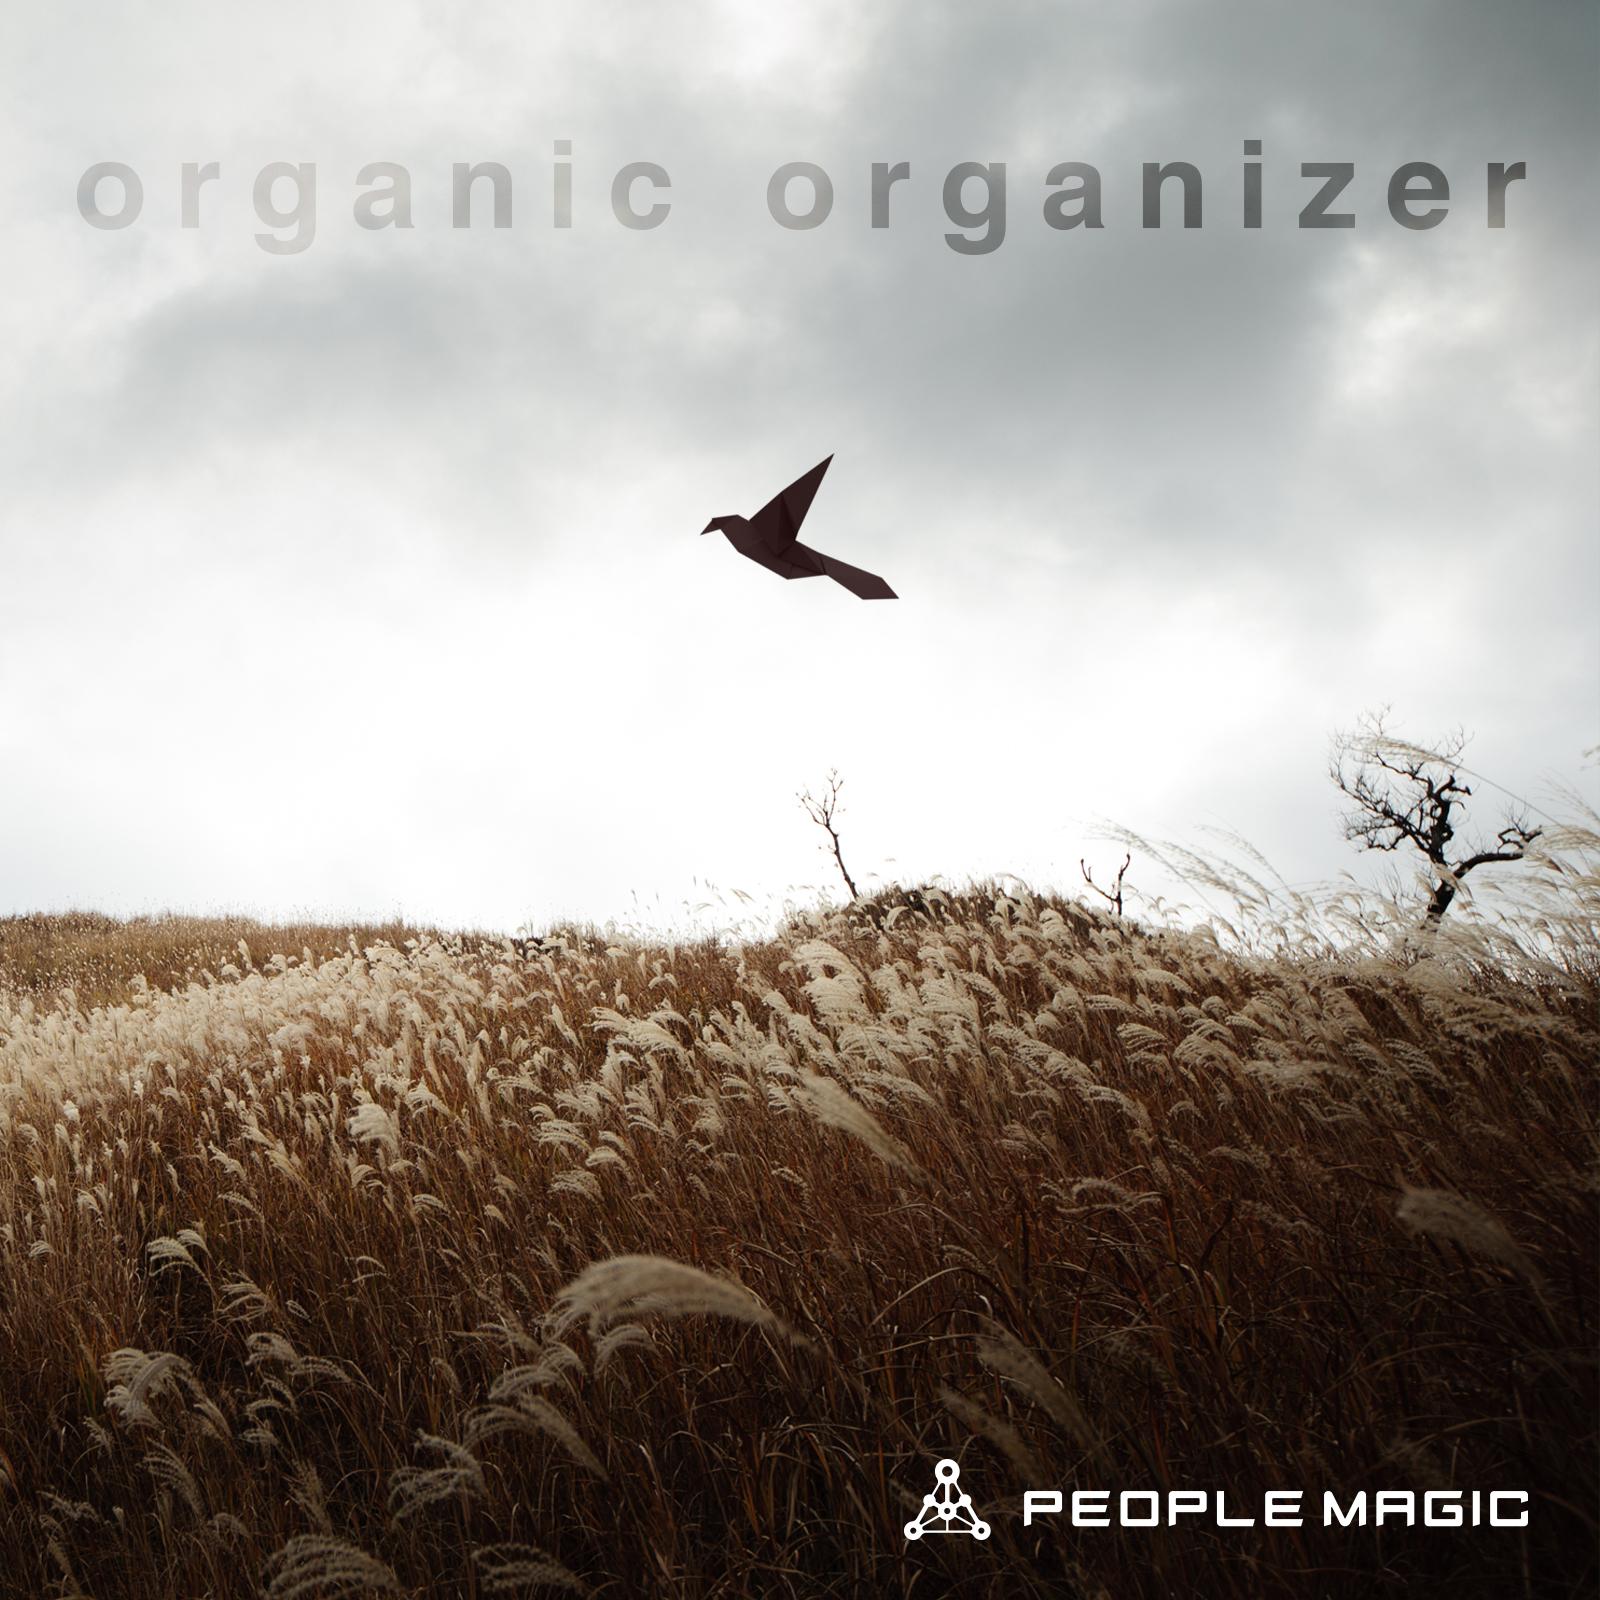 organic organizer